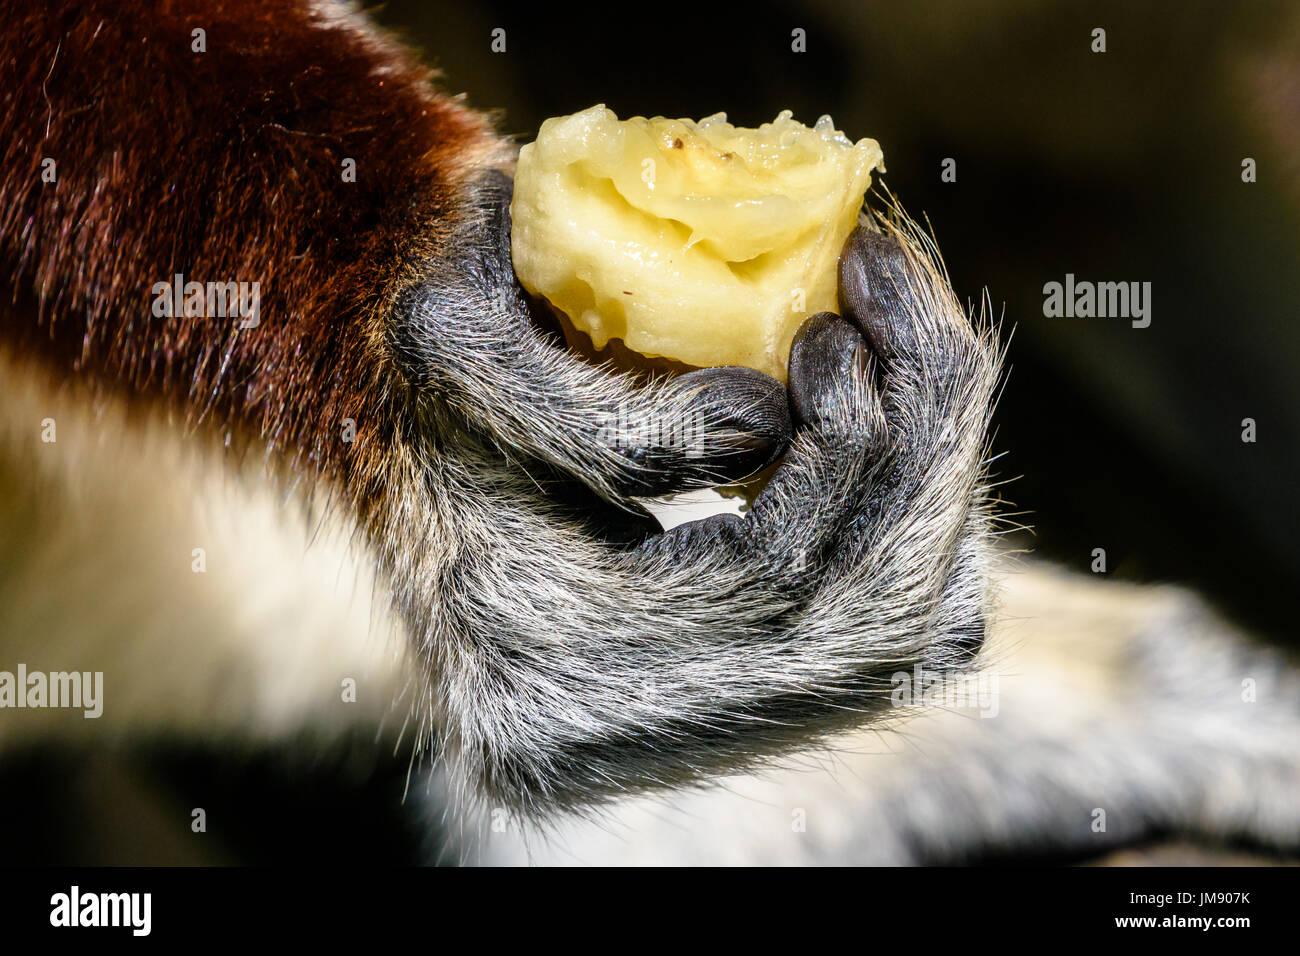 Close up of Sifaka lemur hand with banana - Stock Image